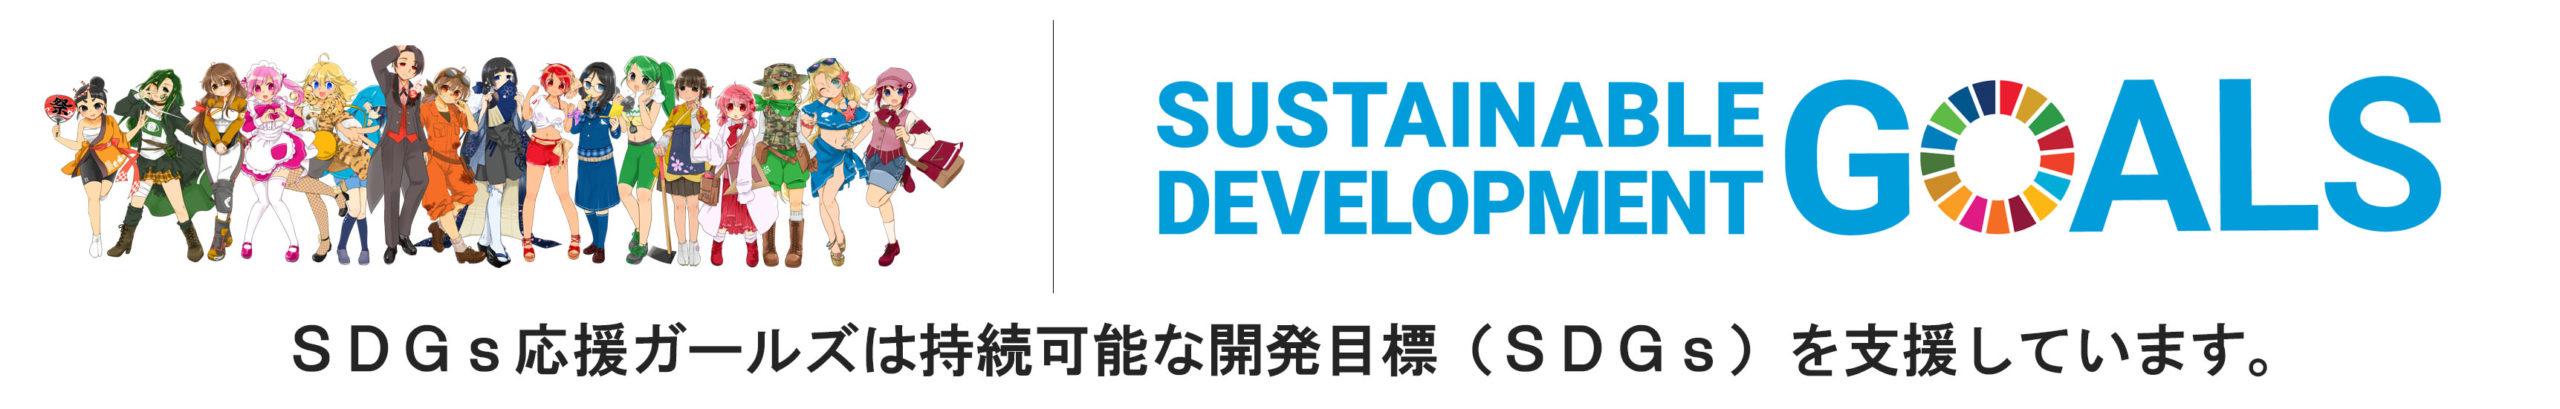 SDGs応援ガールズ